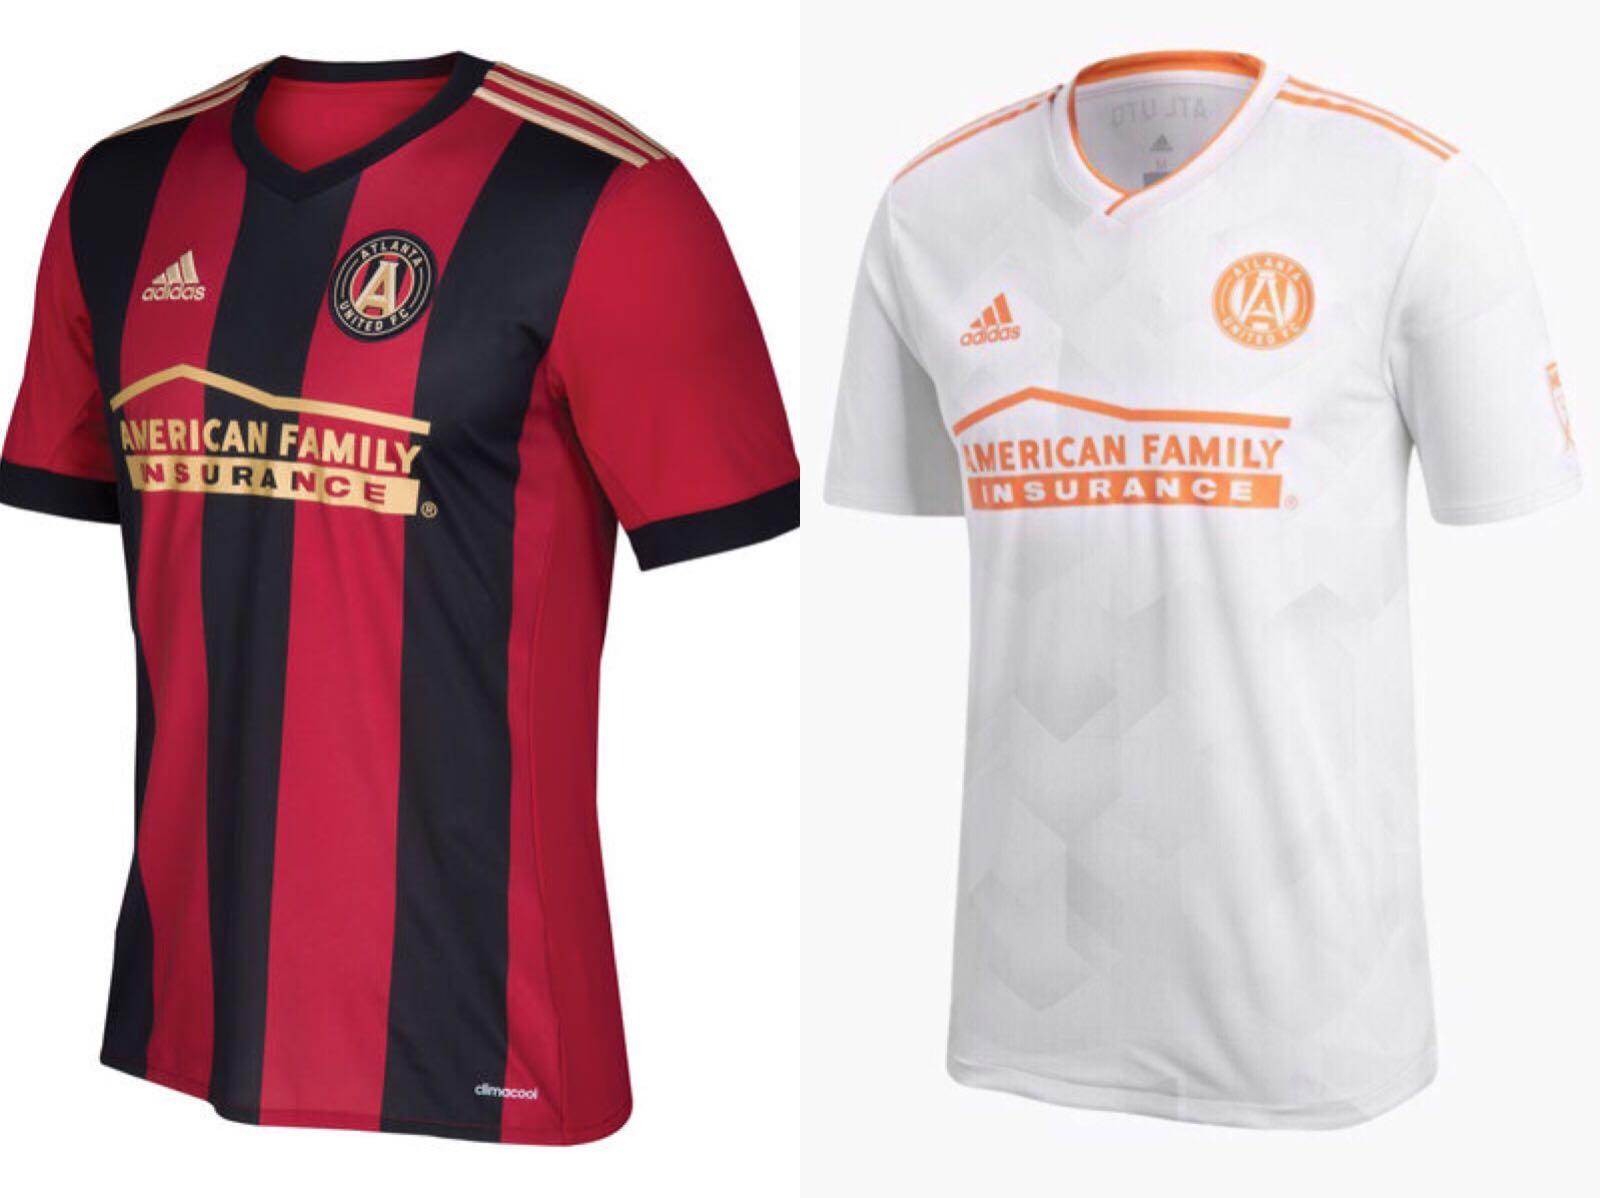 online retailer 4686e 45281 18/19 Atlanta United Kits